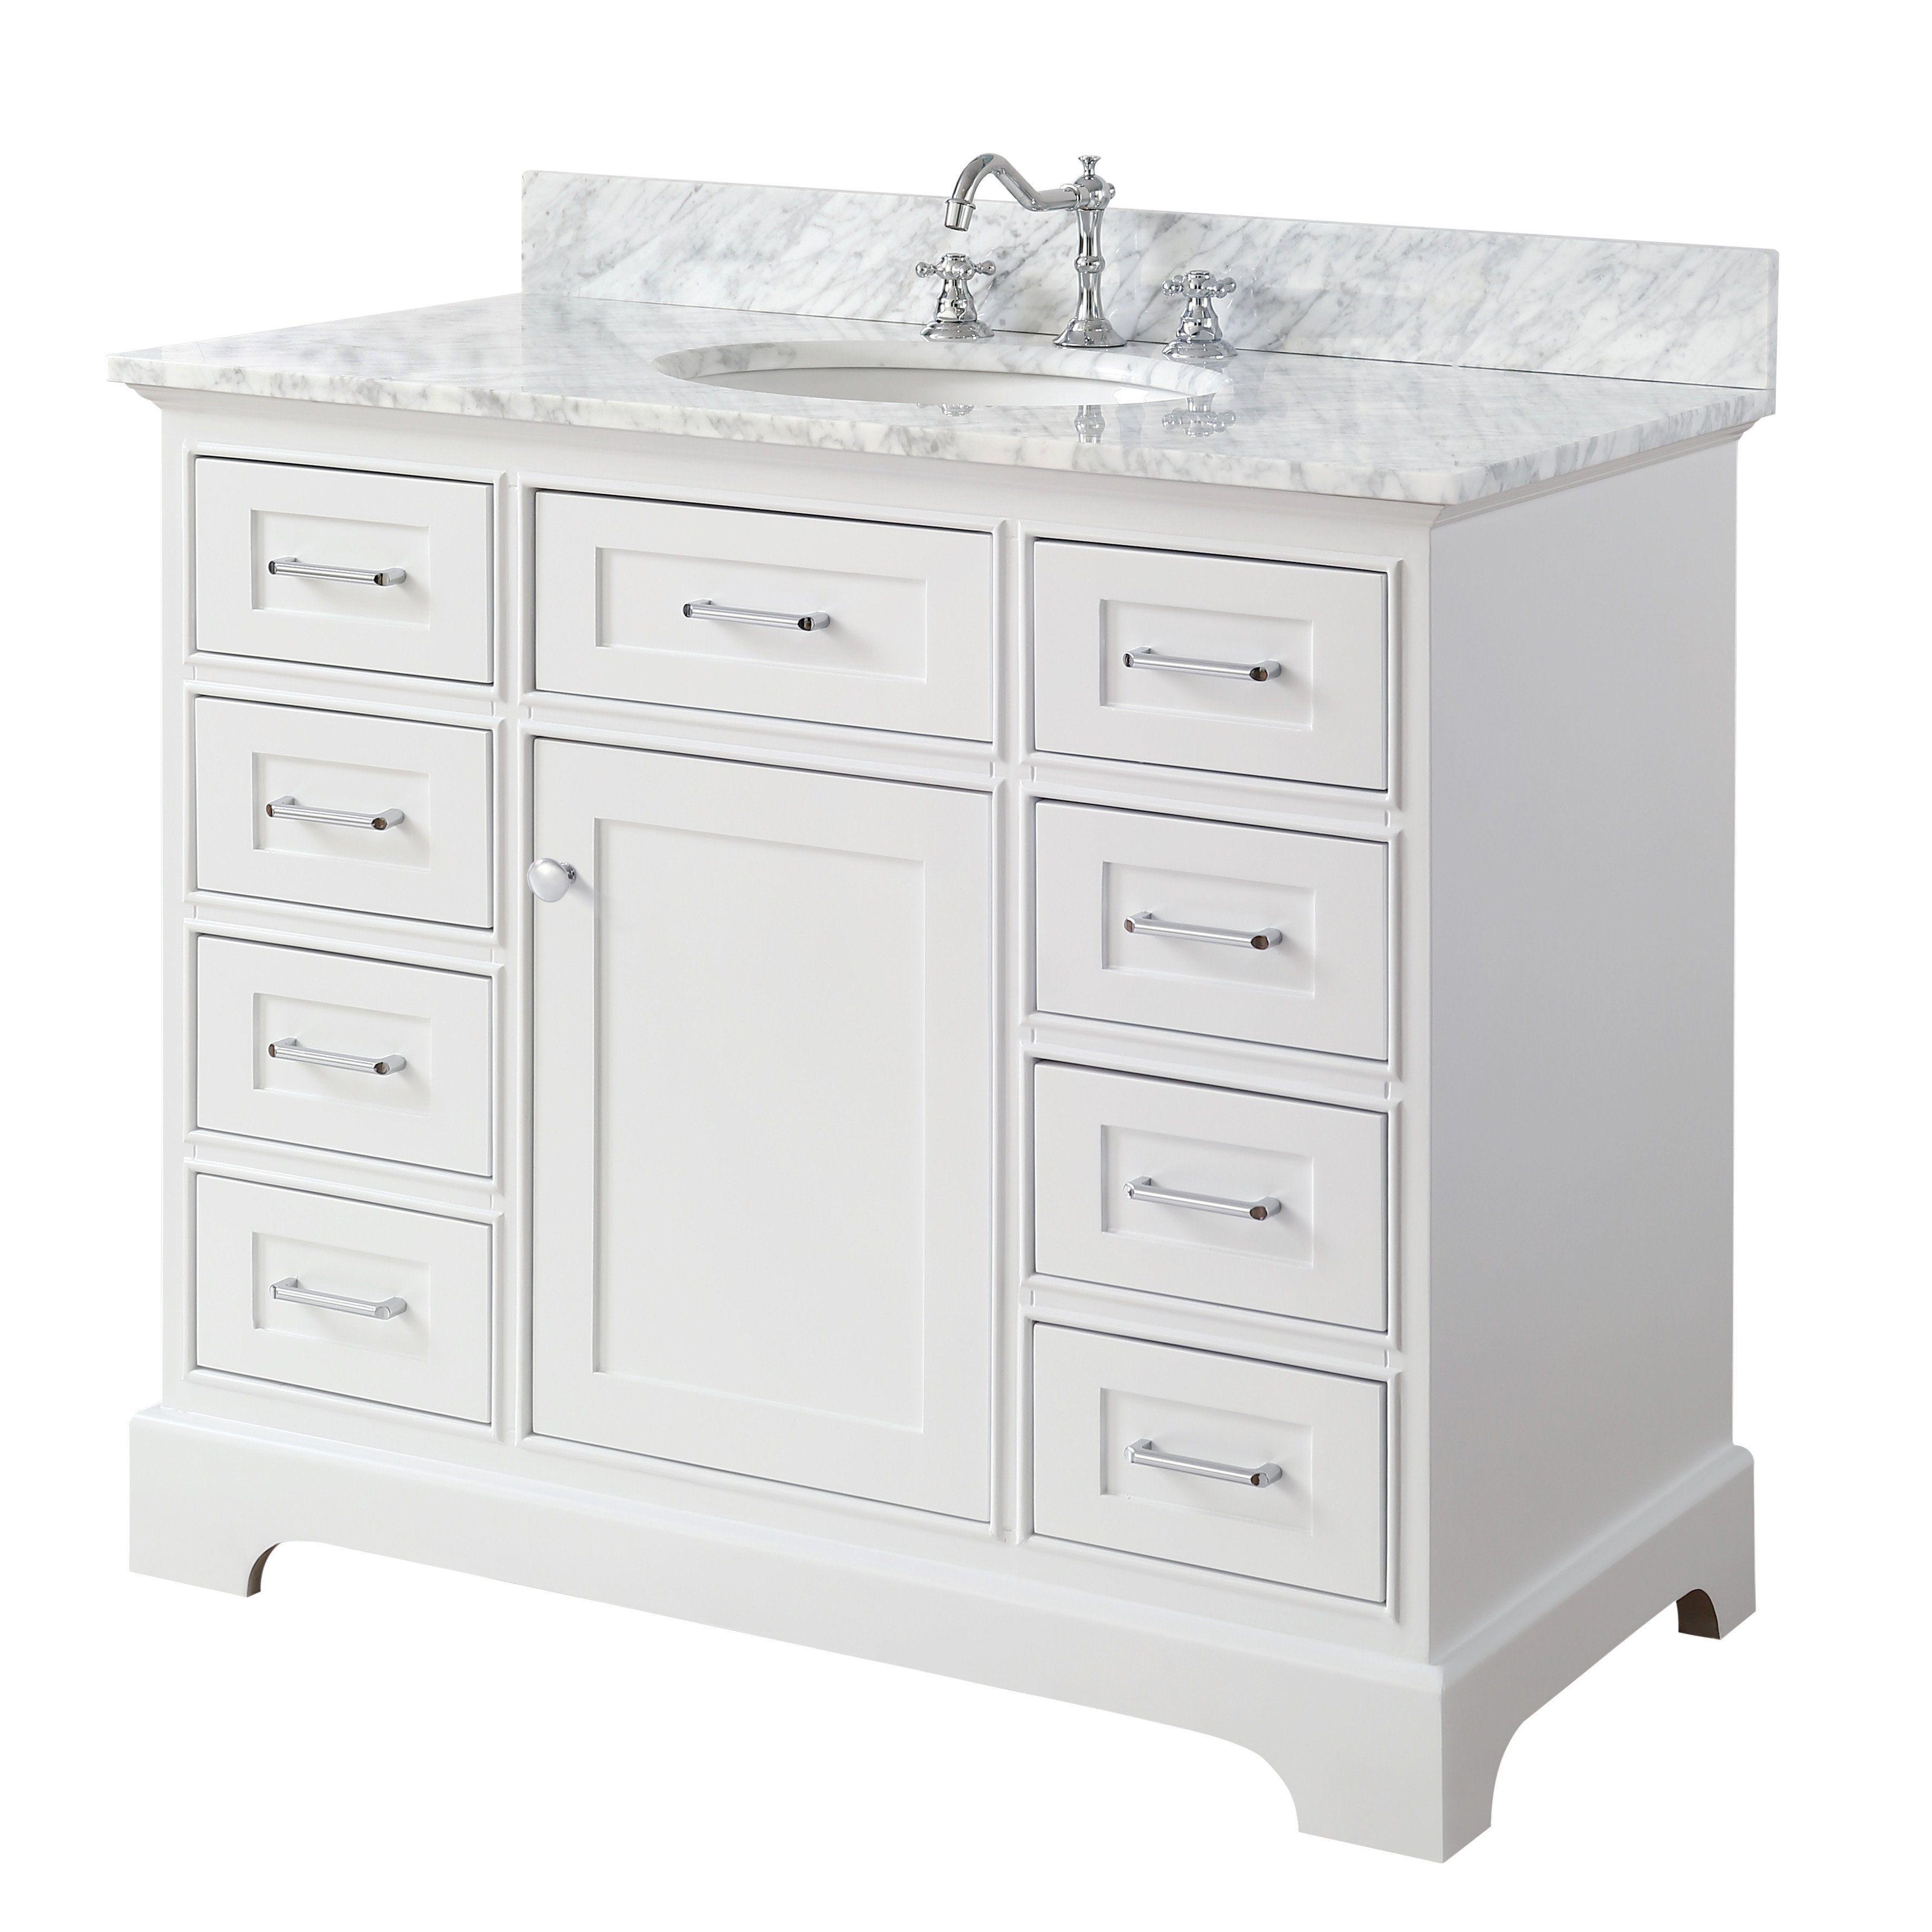 Aria 42 inch Vanity Carrara White